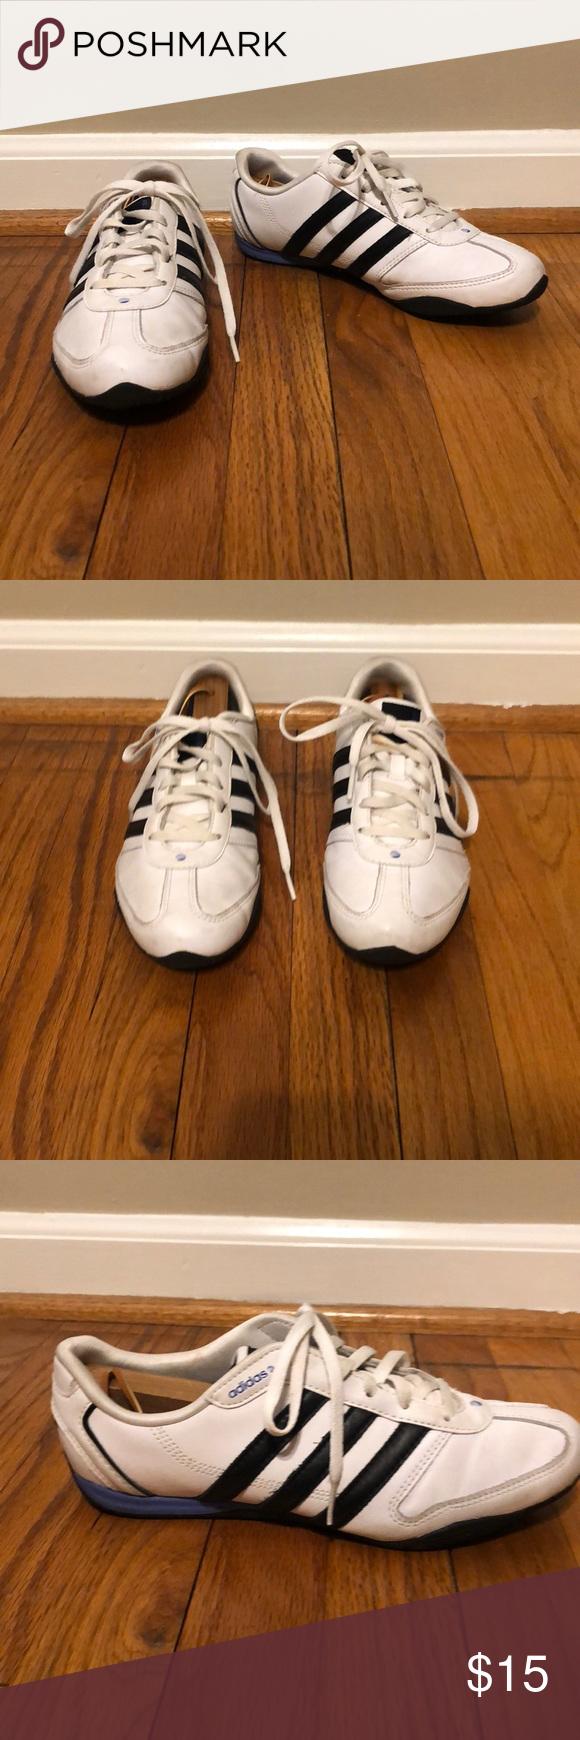 material seleccionado profesional mejor calificado talla 7 Woman's Adidas Vibetouch Sneakers Ladies 8.5 Good condition, see ...